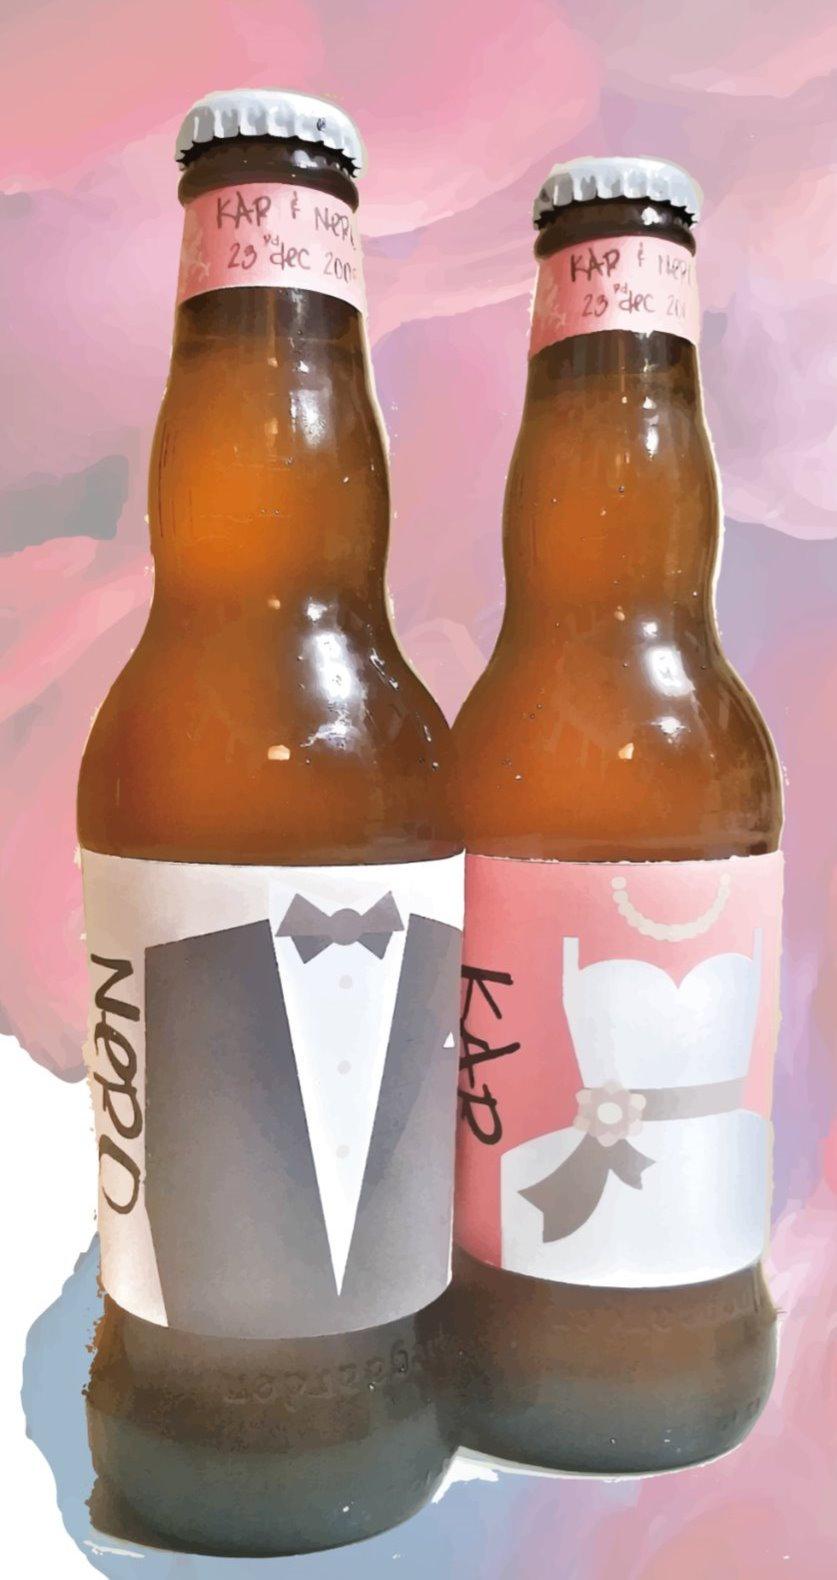 Bottle label design 酒瓶設計